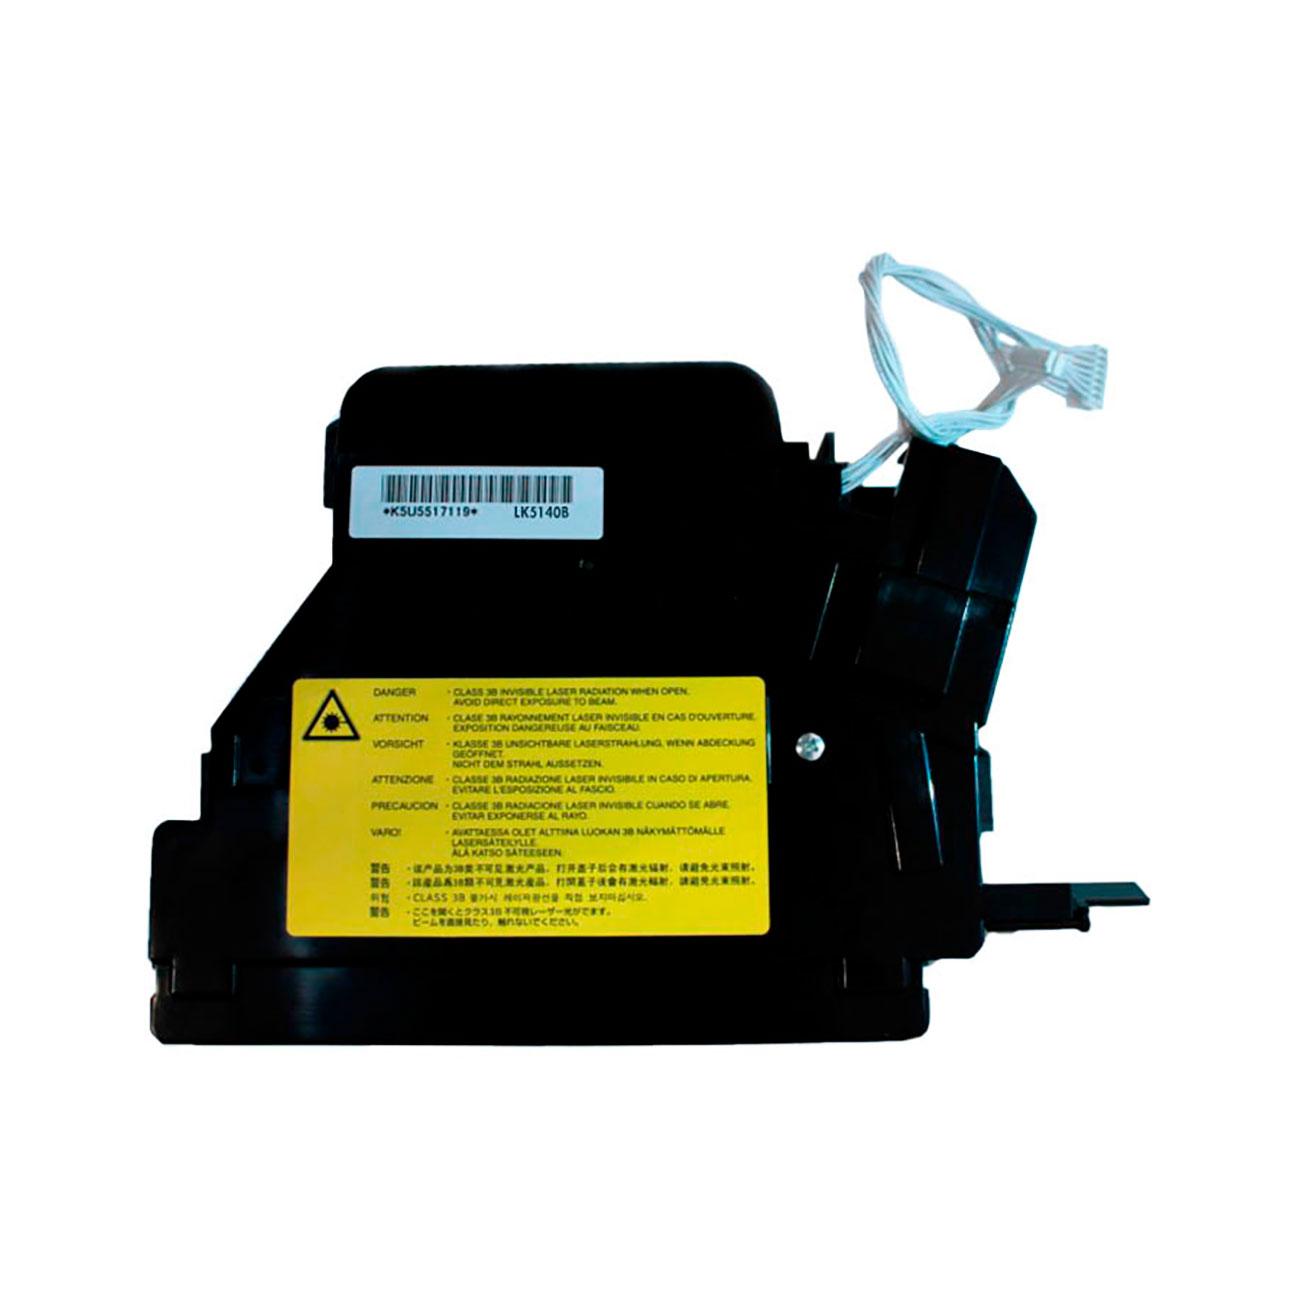 Фото Блок лазера Kyocera LK-5140B для Kyocera ECOSYS P6130cdn, P6035cdn, P7040cdn, P6130cdn, P7040cdn {302NR93080}